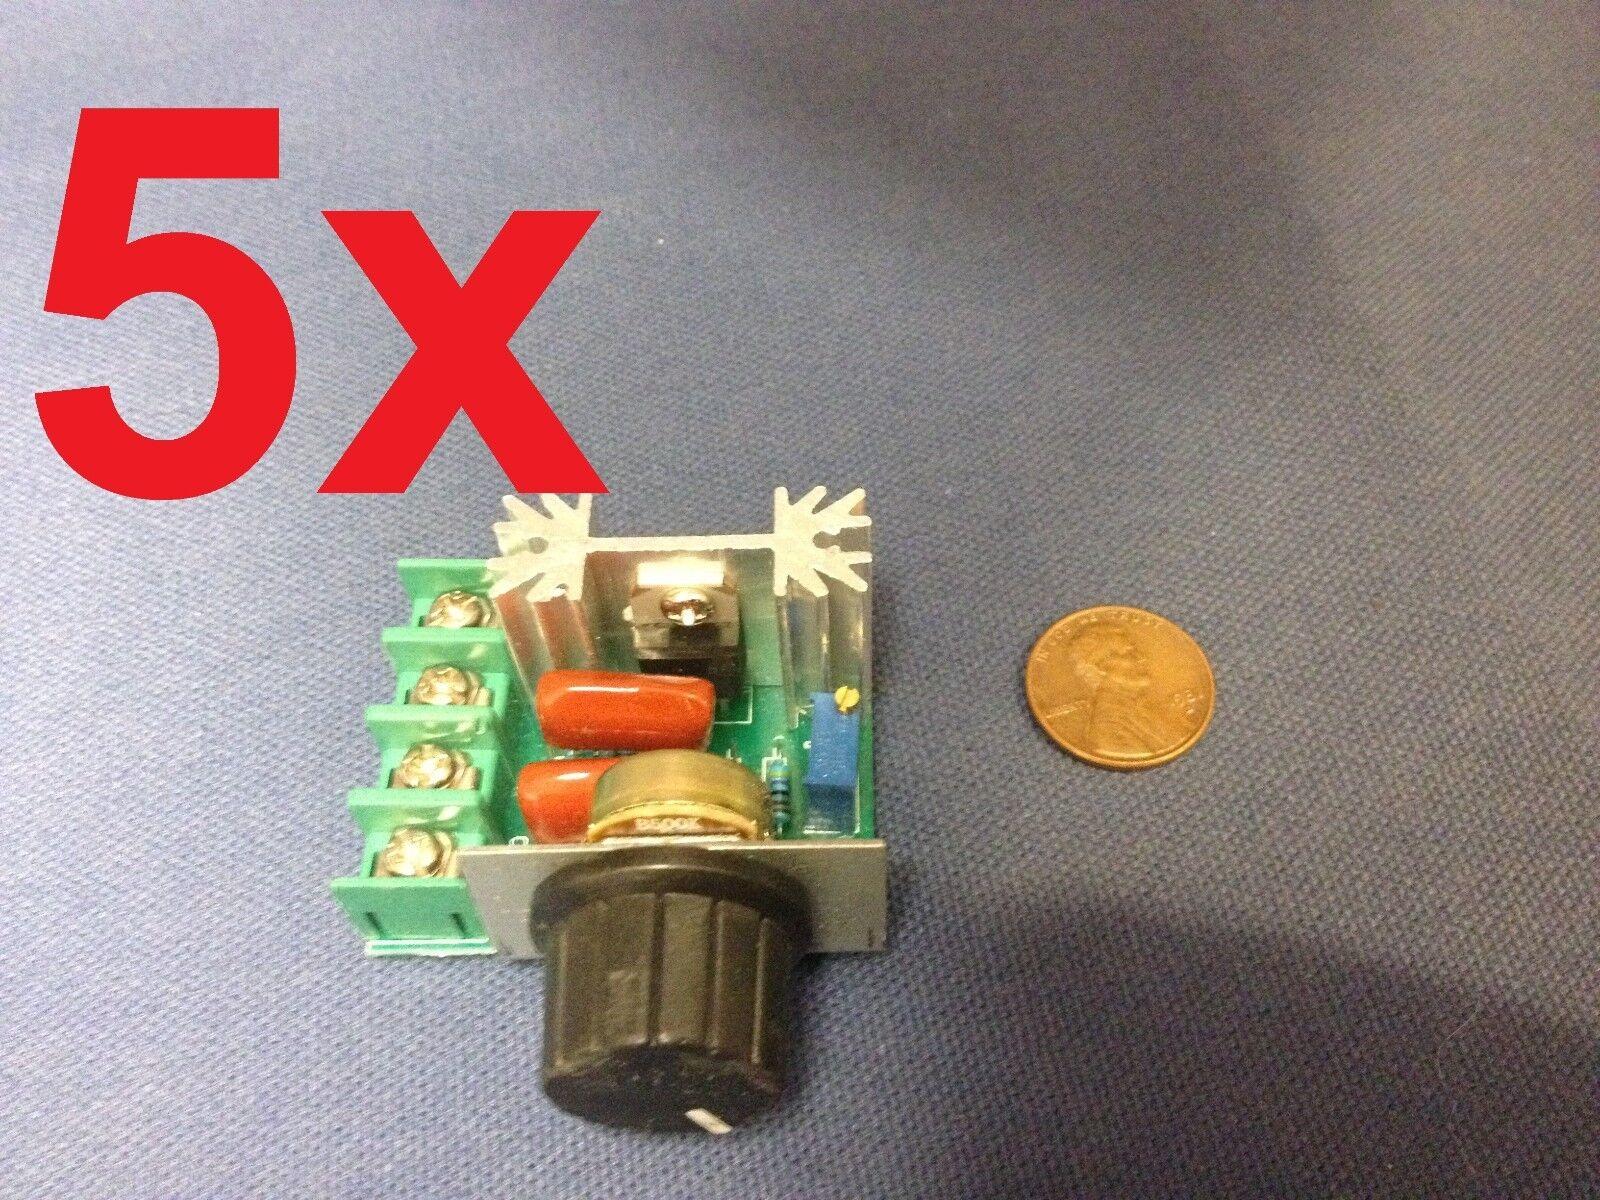 5x -- 220V 2000W Speed Controller SCR Voltage Regulator Dimmer Thermostat HMY c9